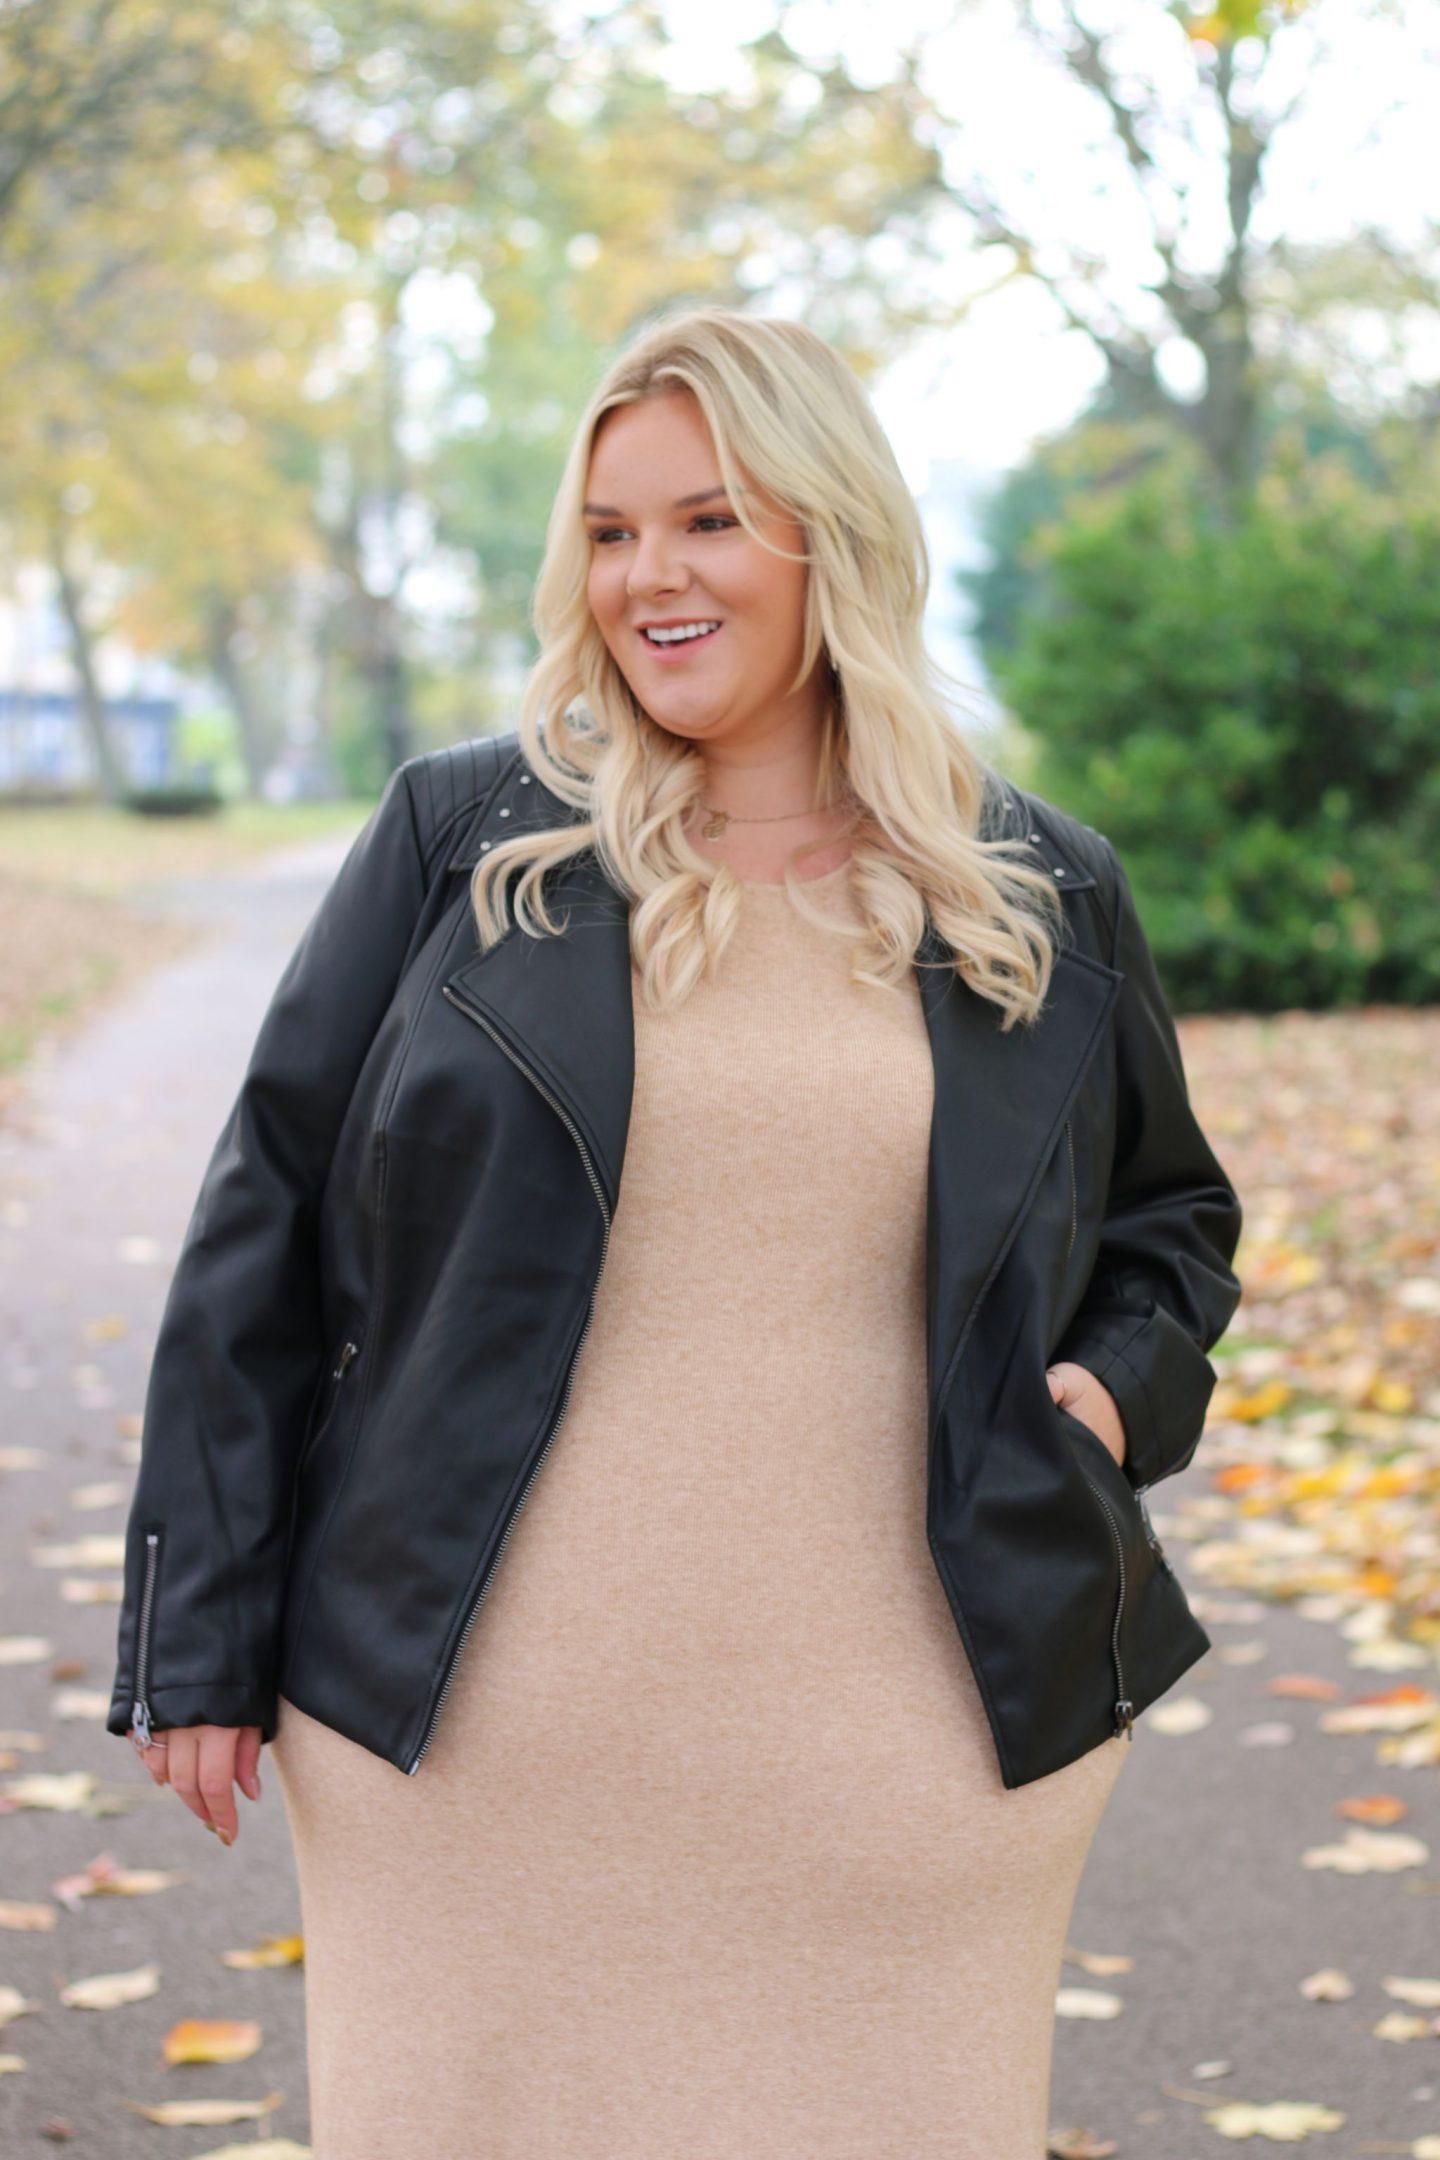 WhatLauraLoves Curvissa Plus Size Fashion